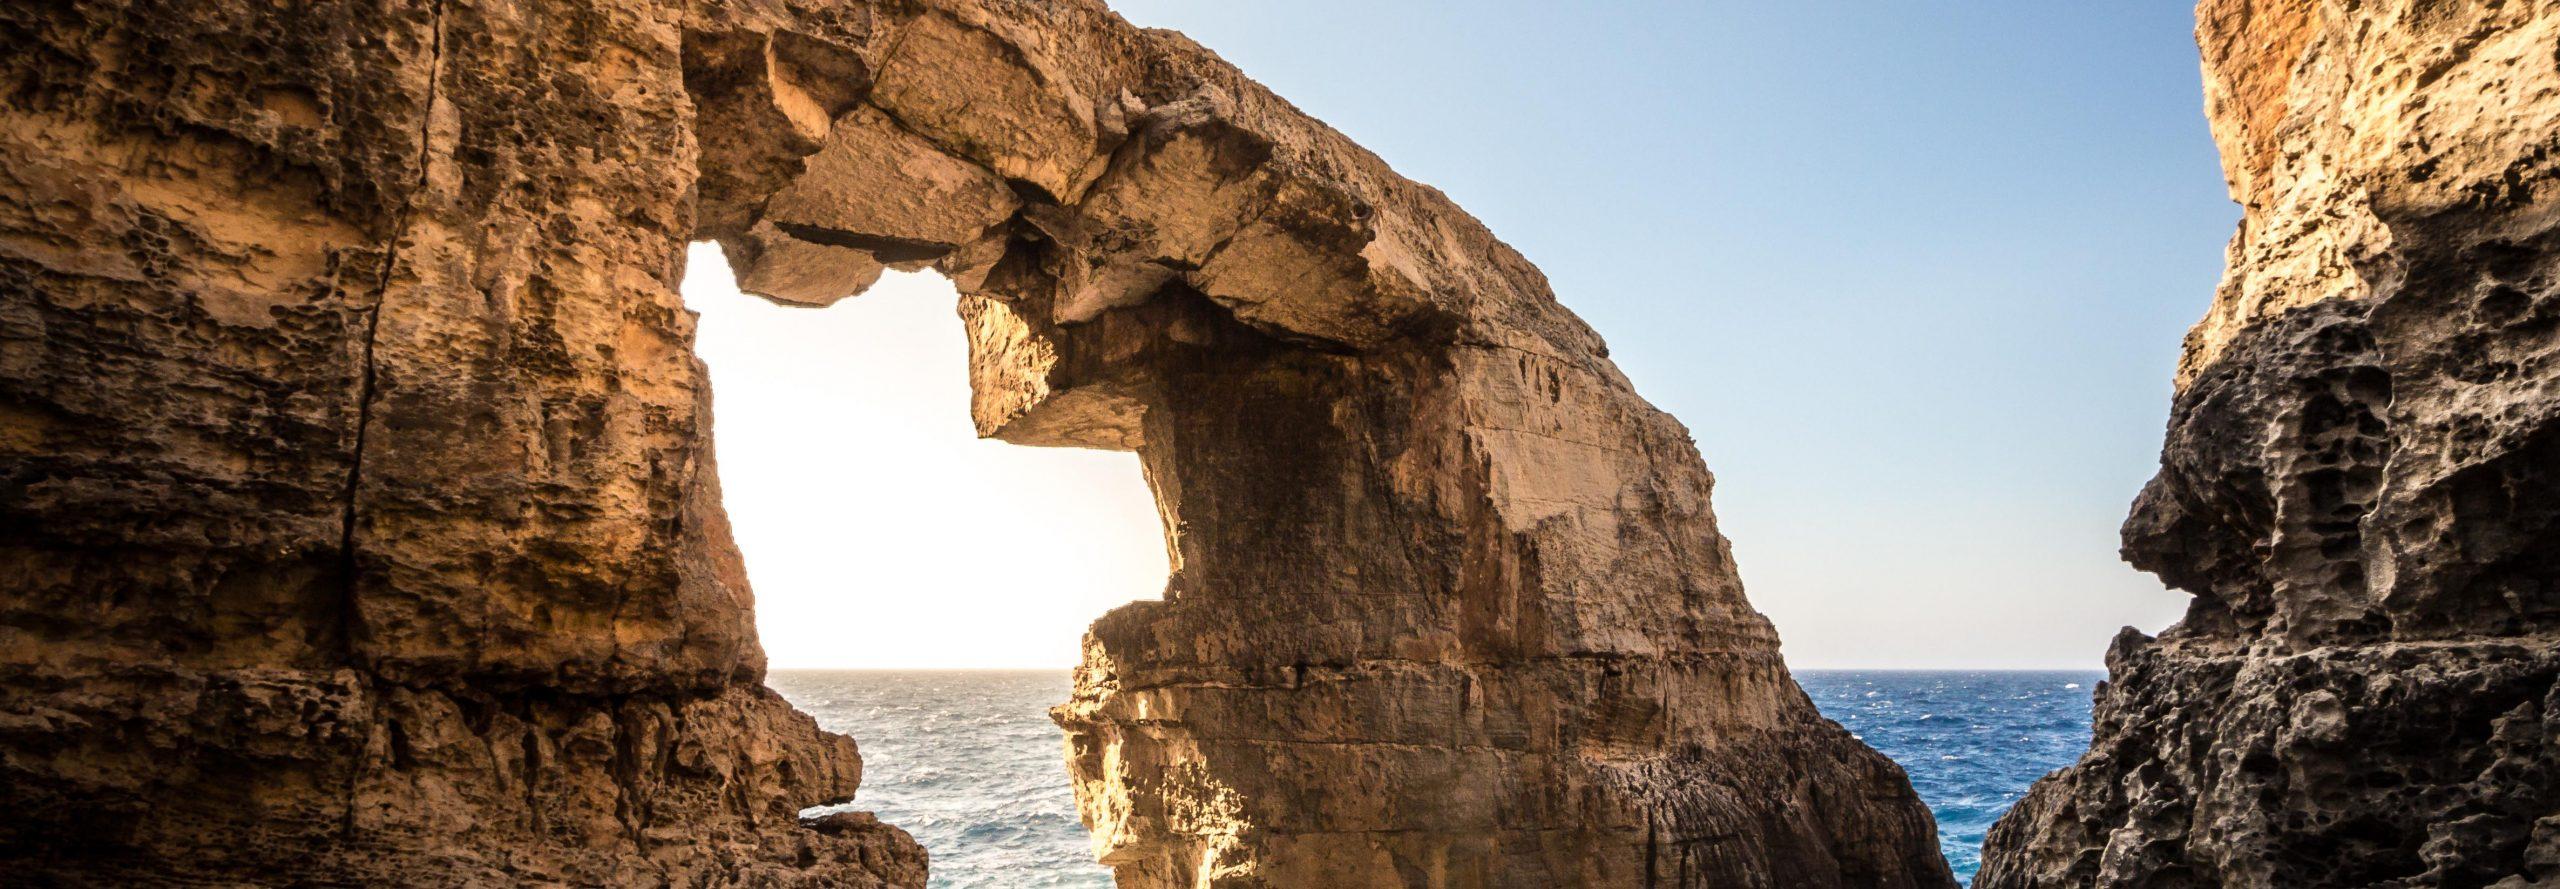 [FORA DA ROTA] Passeio em Gozo: Wied il-Ghasri e Wied il-Mielah